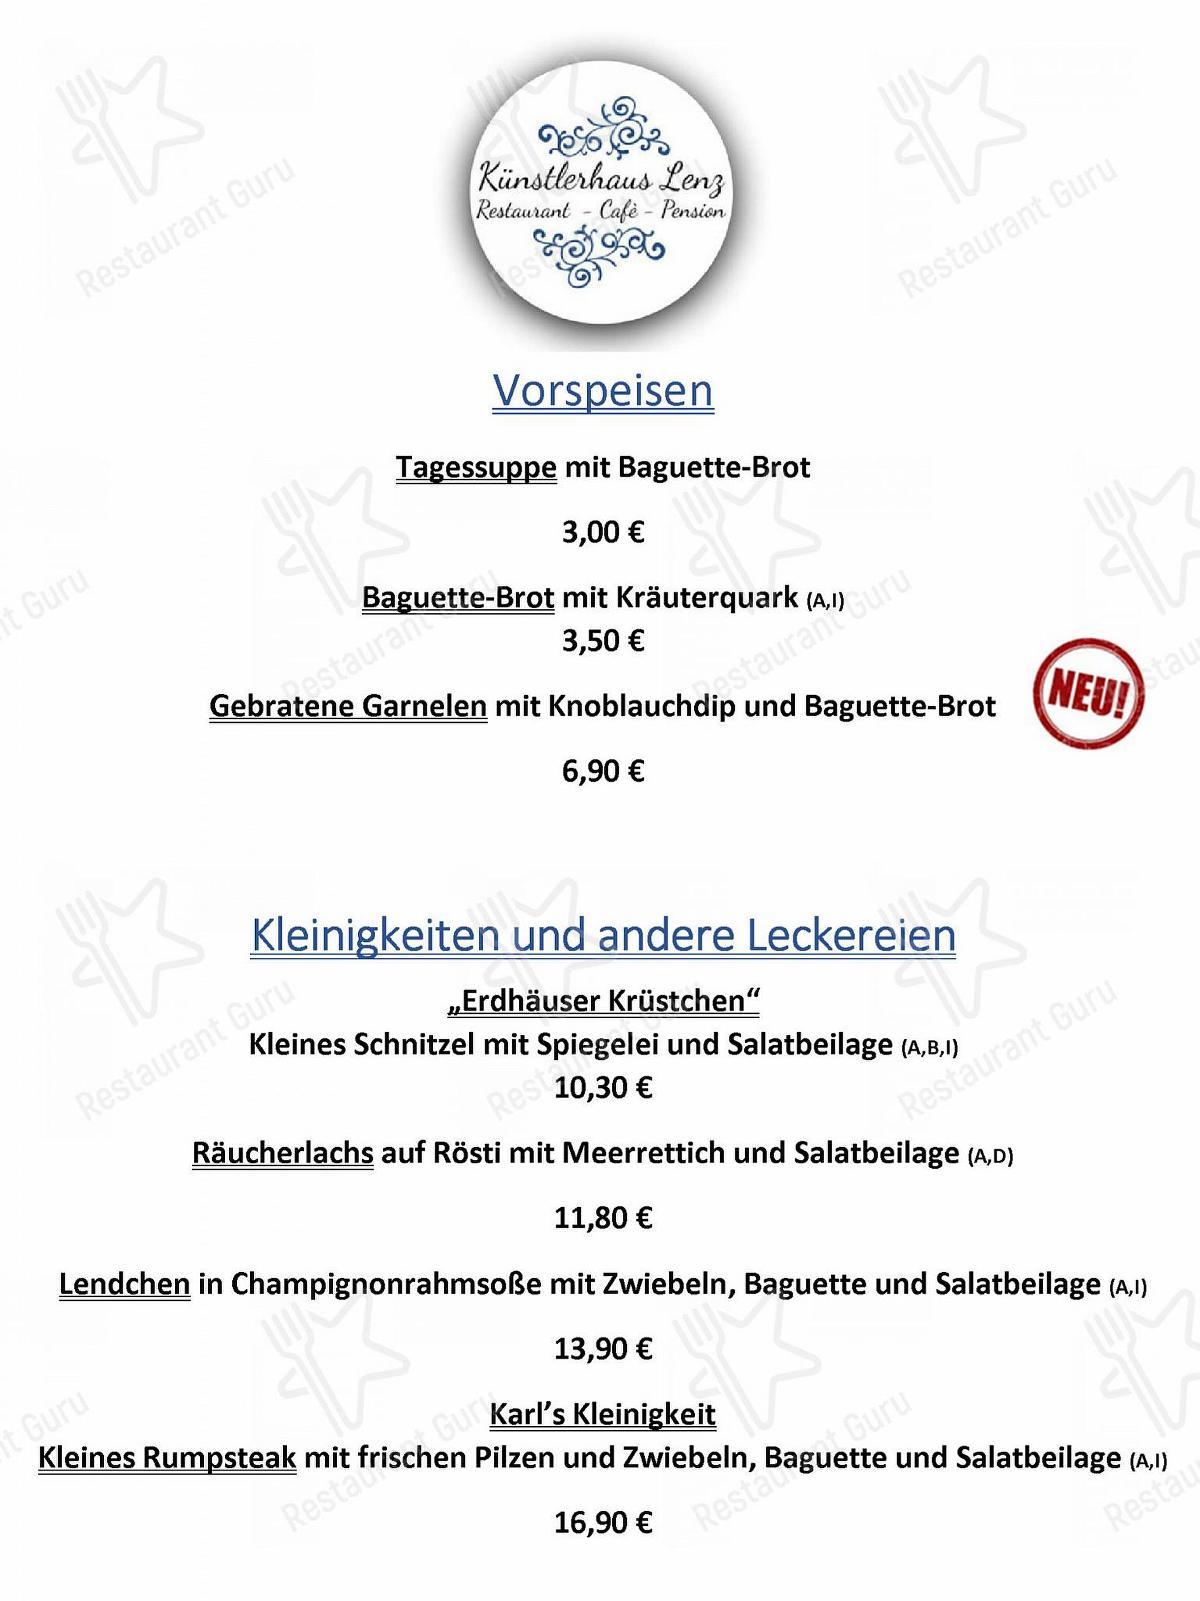 Меню кафе Restaurant Künstlerhaus Lenz